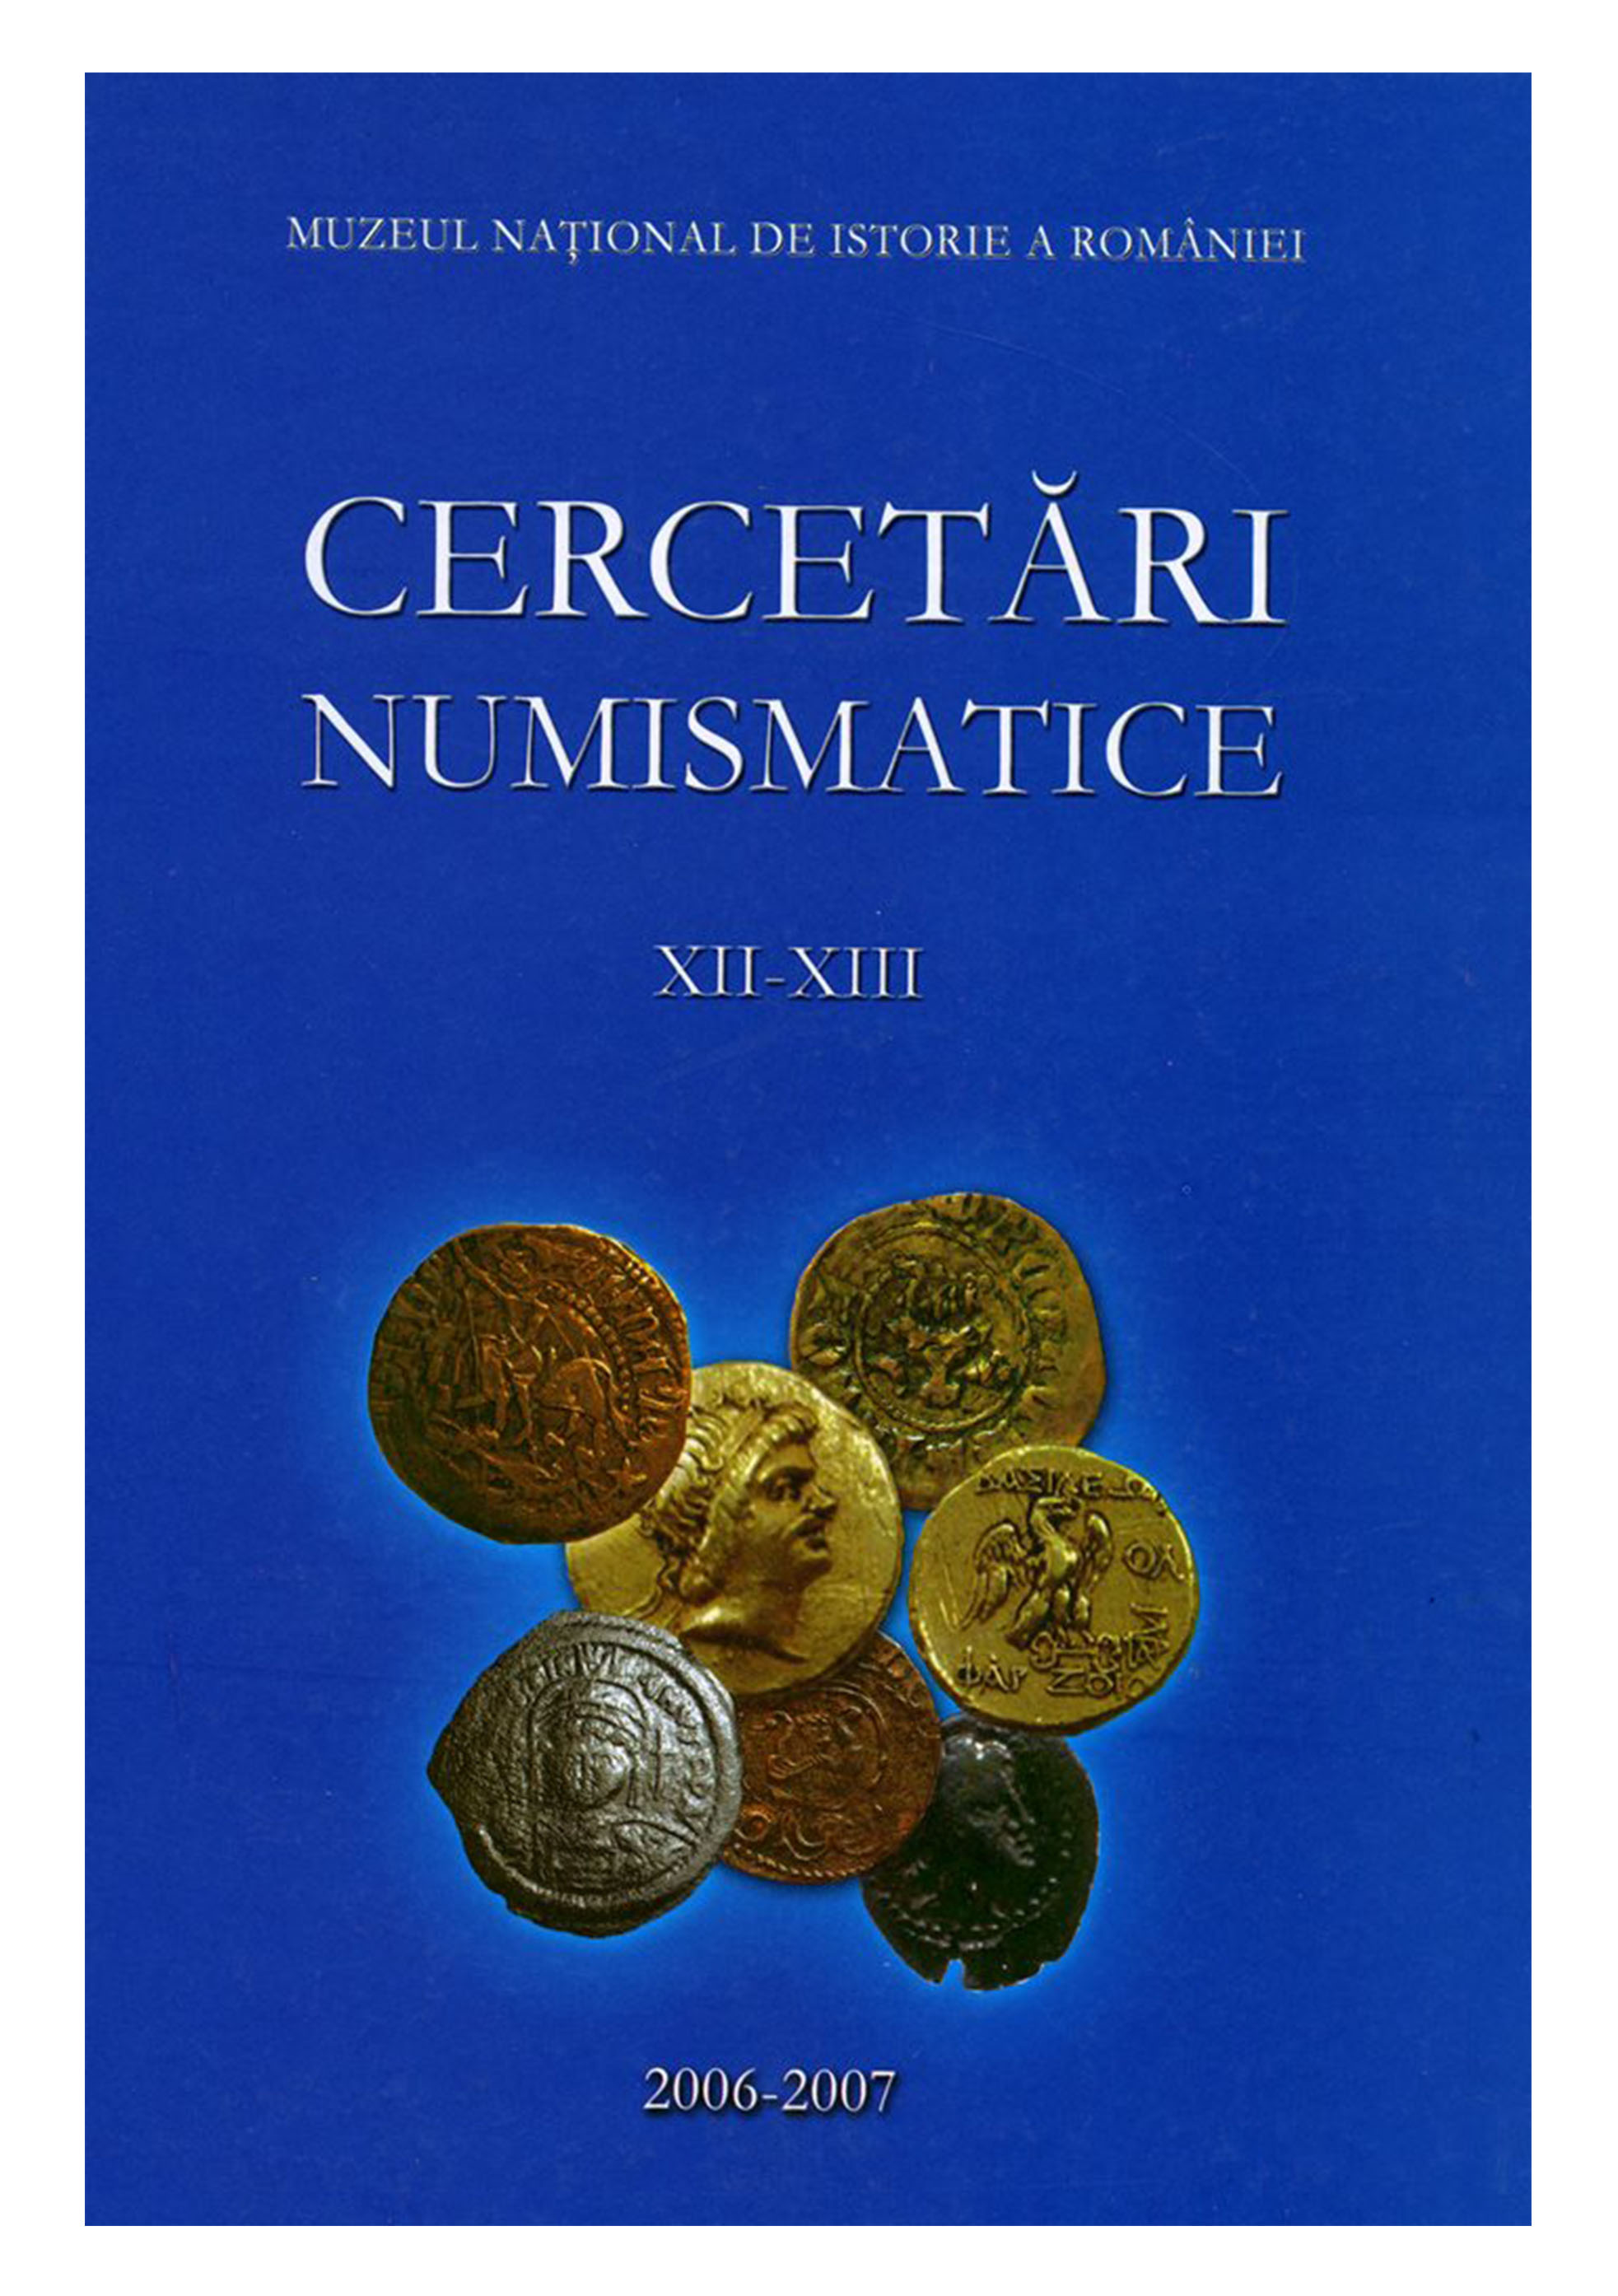 mnir_COP__0061_2006-2007_Cercetari-numismatice-XII-XIII_570pag